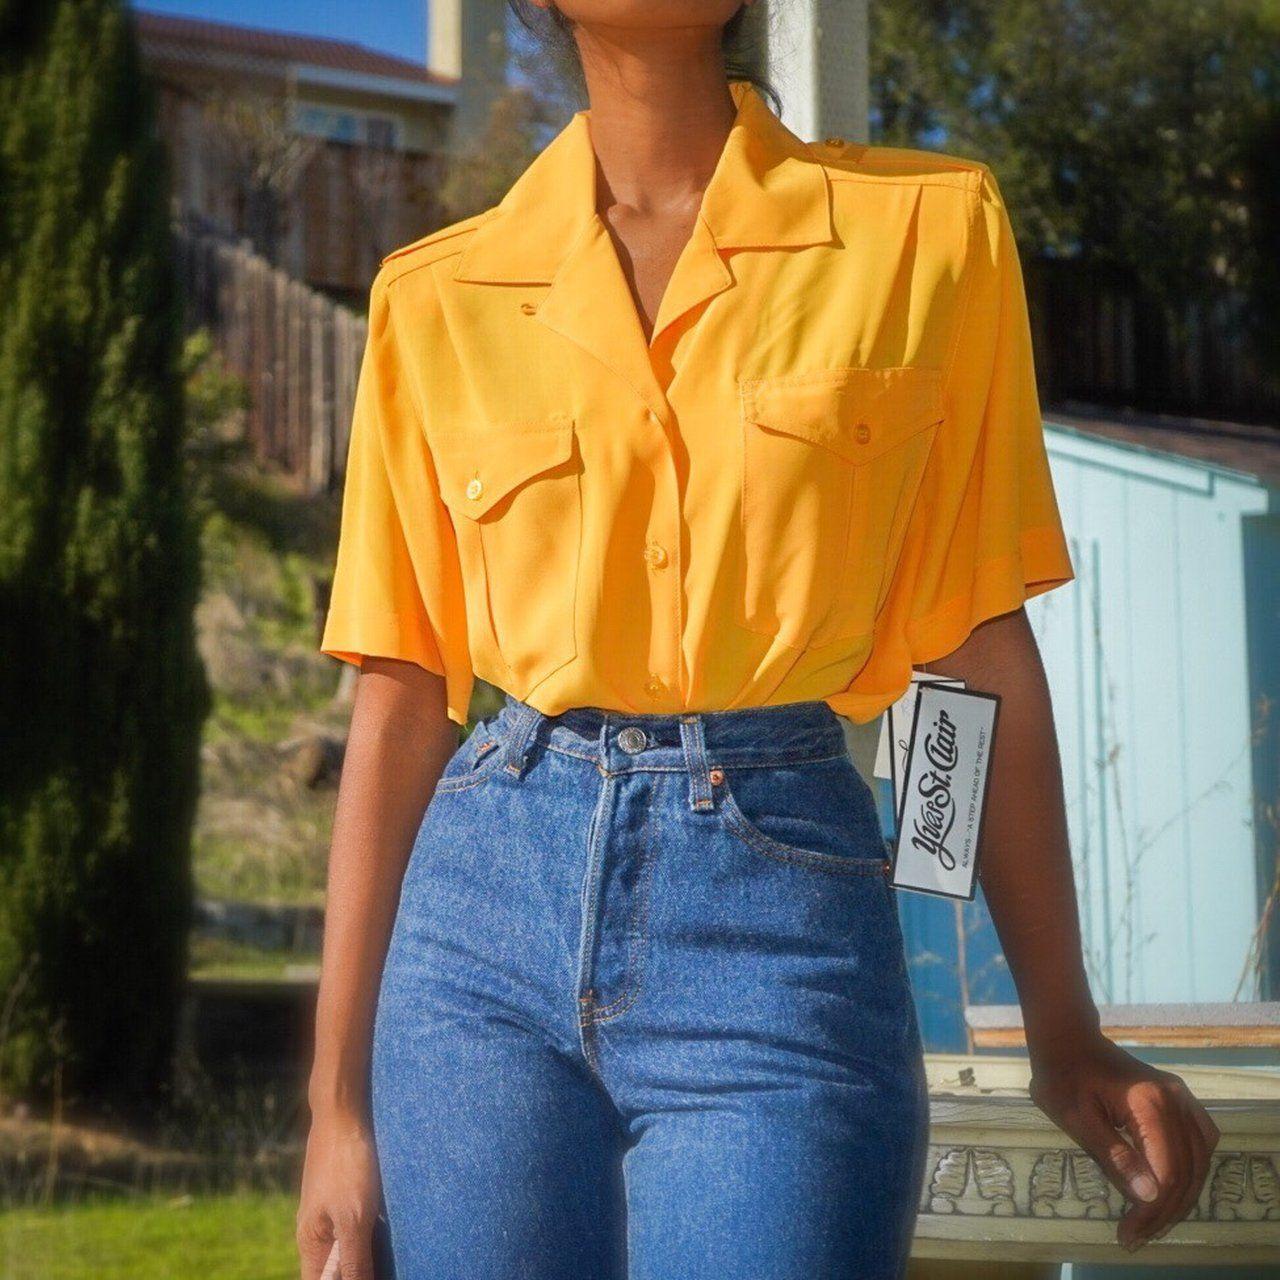 Vtg 80s golden yellow silky polyester safari shirt... - Depop